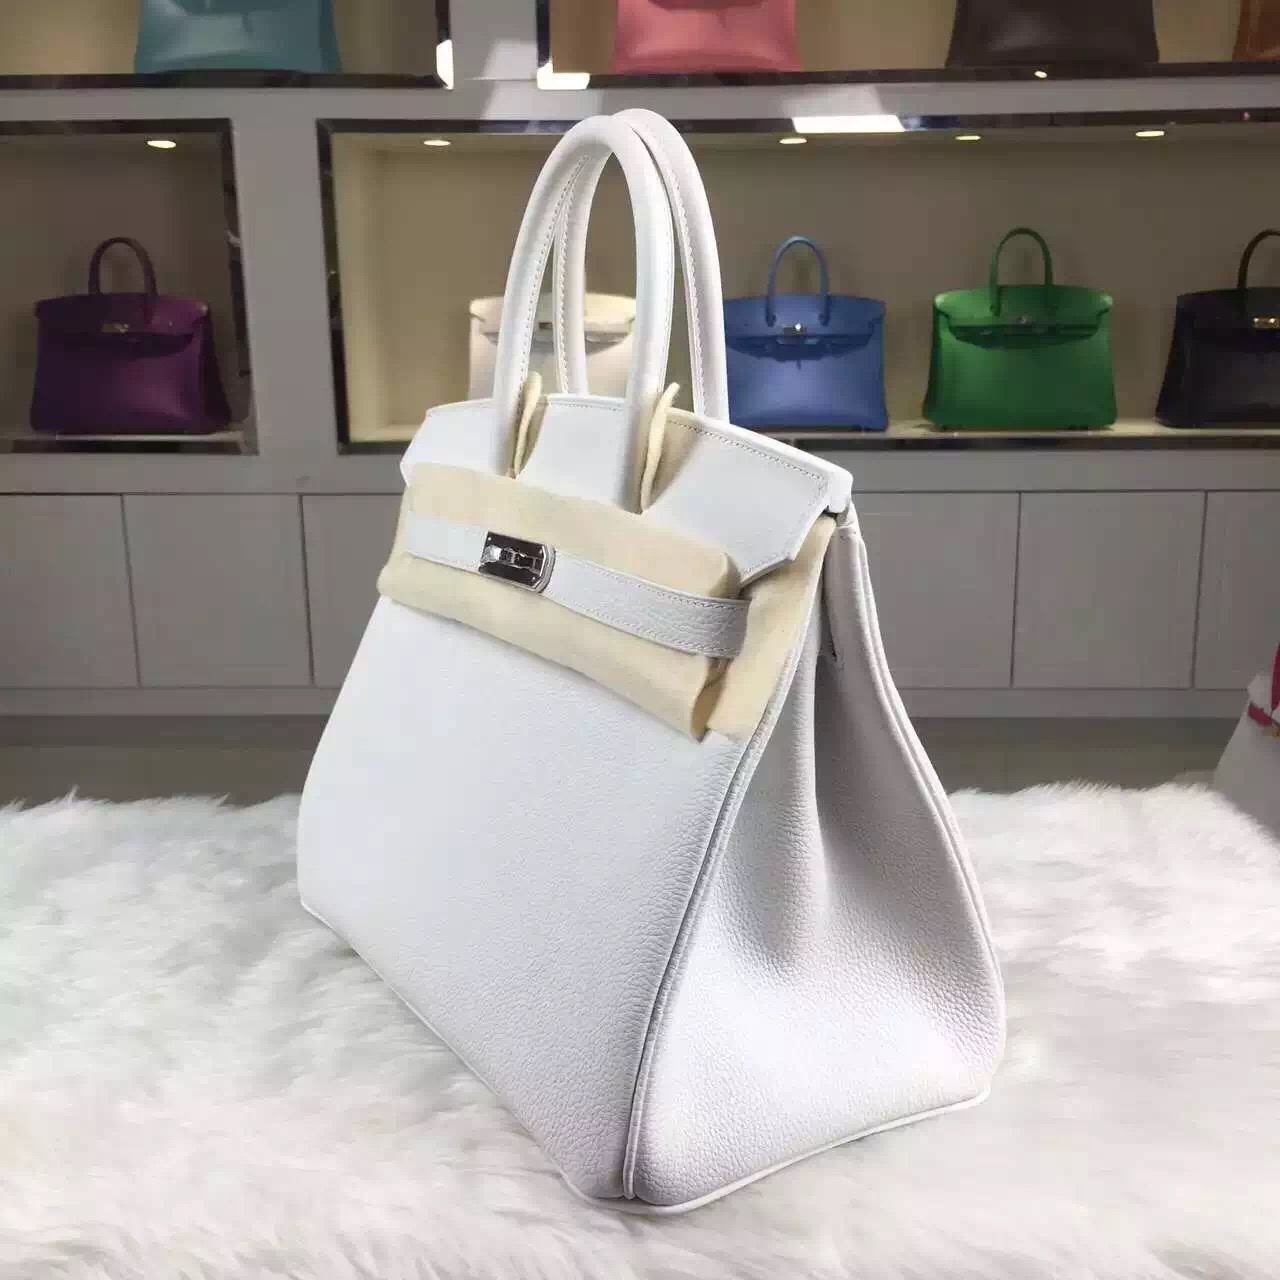 Hermes Birkin 30CM 01 White France Togo Leather Elegant Ladies' Tote Bag